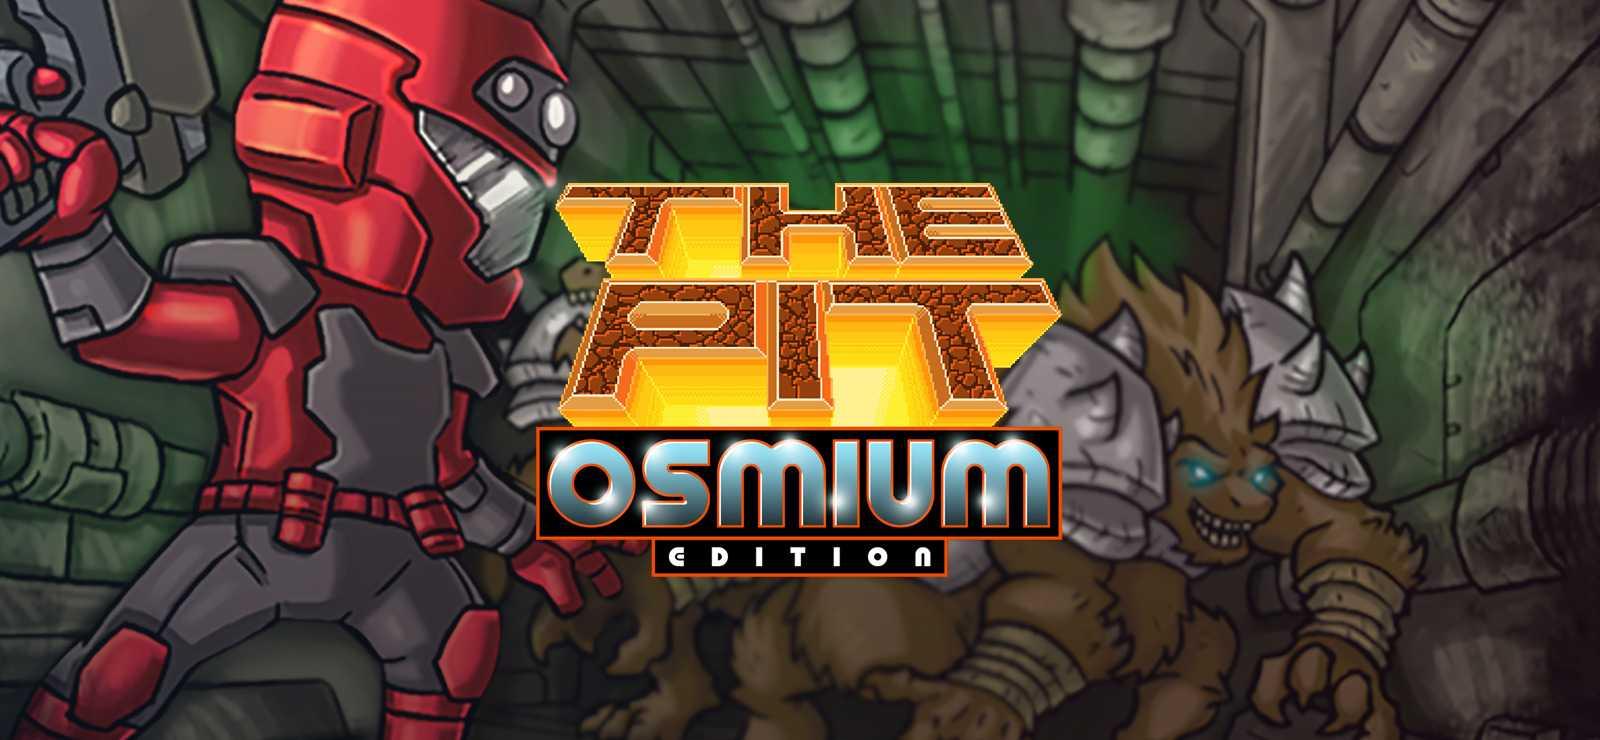 Sword of the Stars: The Pit Osmium Edition